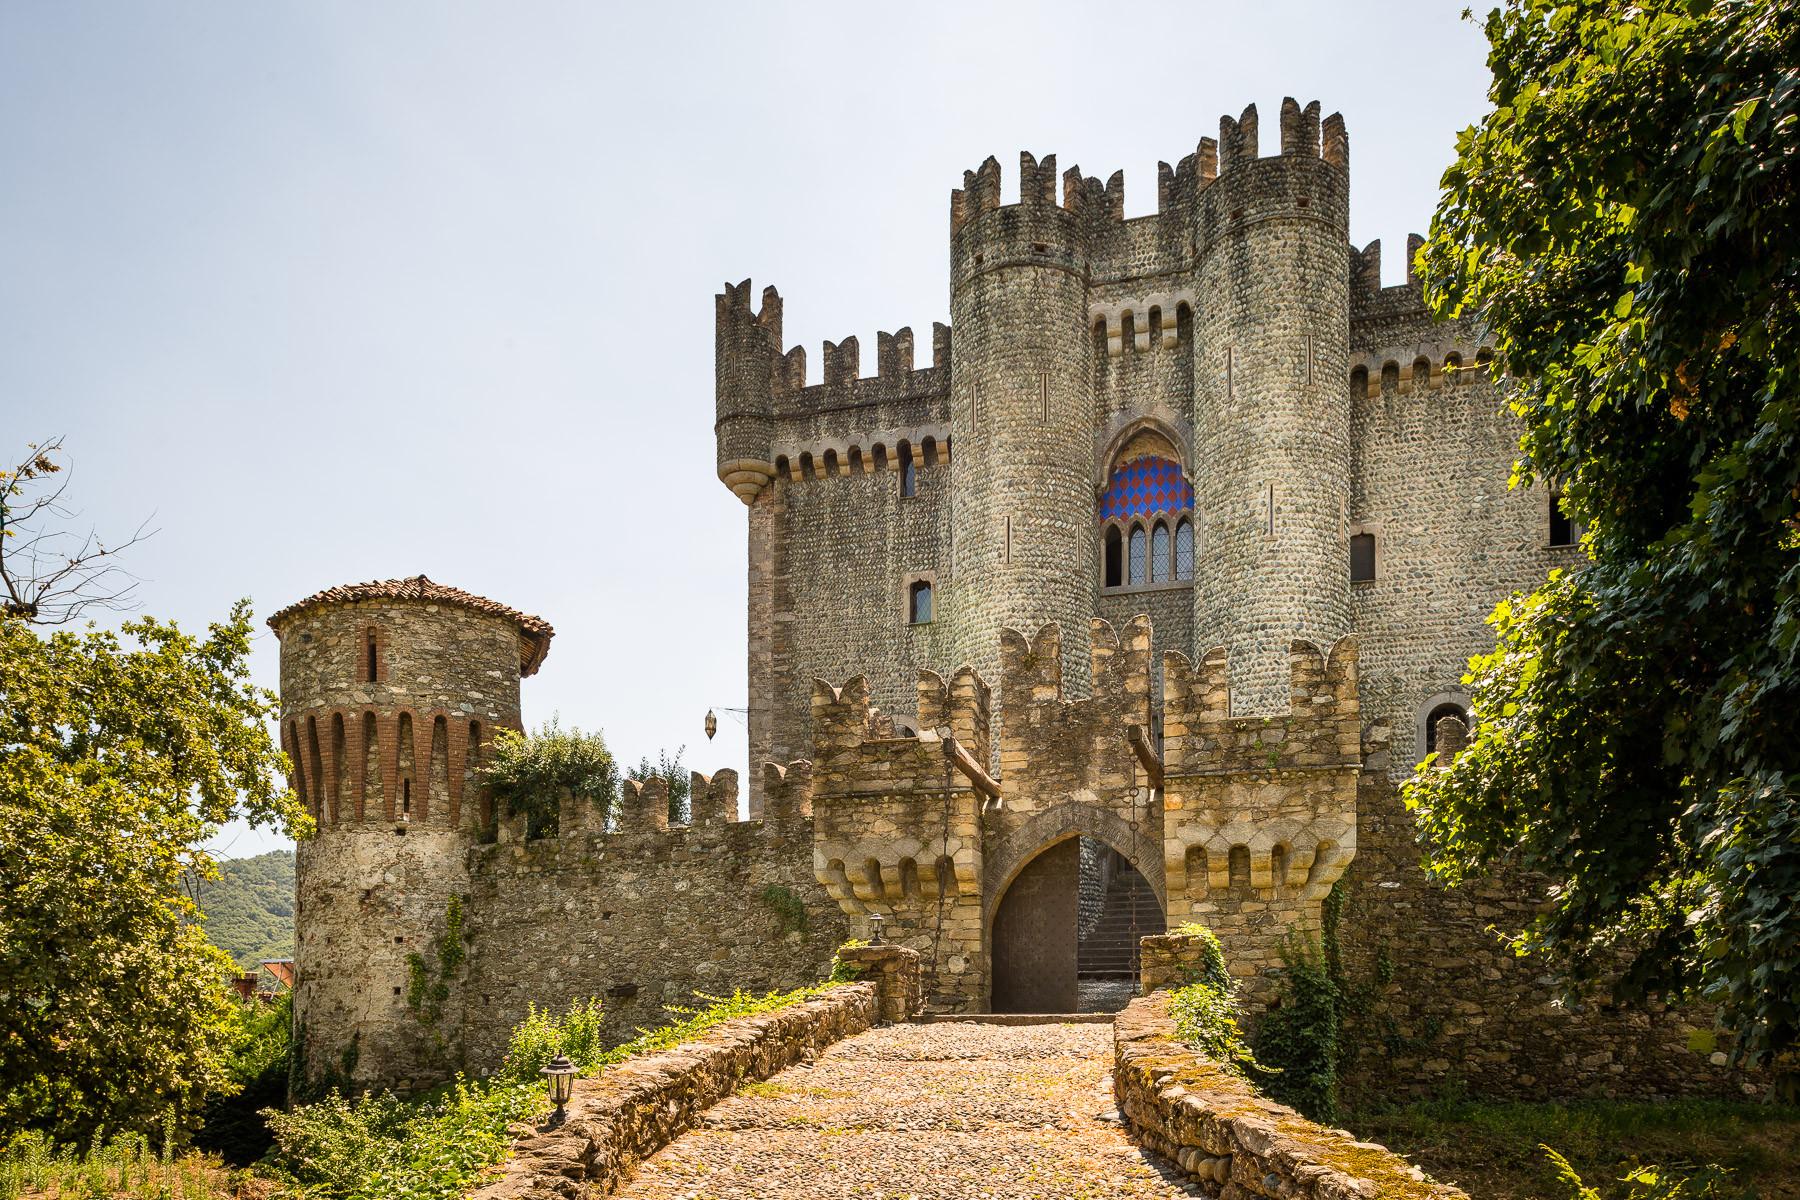 Castellar, Via Cambiano